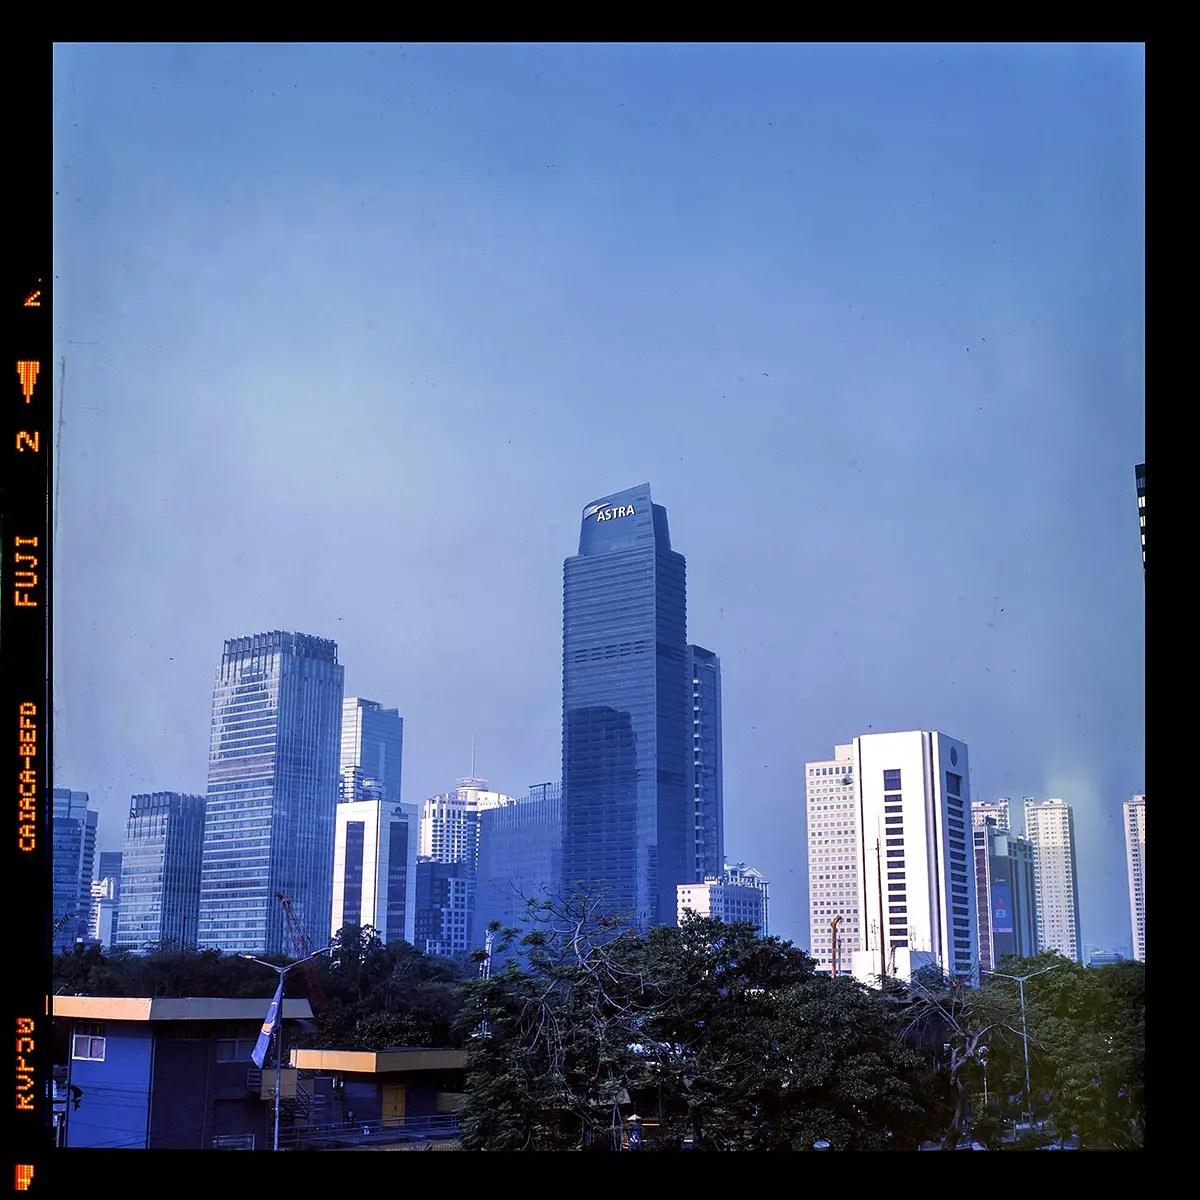 5 Frames... Of Fujifilm Velvia 50 developed using C-41 and BW chemistry (EI 50 / 120 format / Rolleiflex 2.8D) by Mustakim Irsan